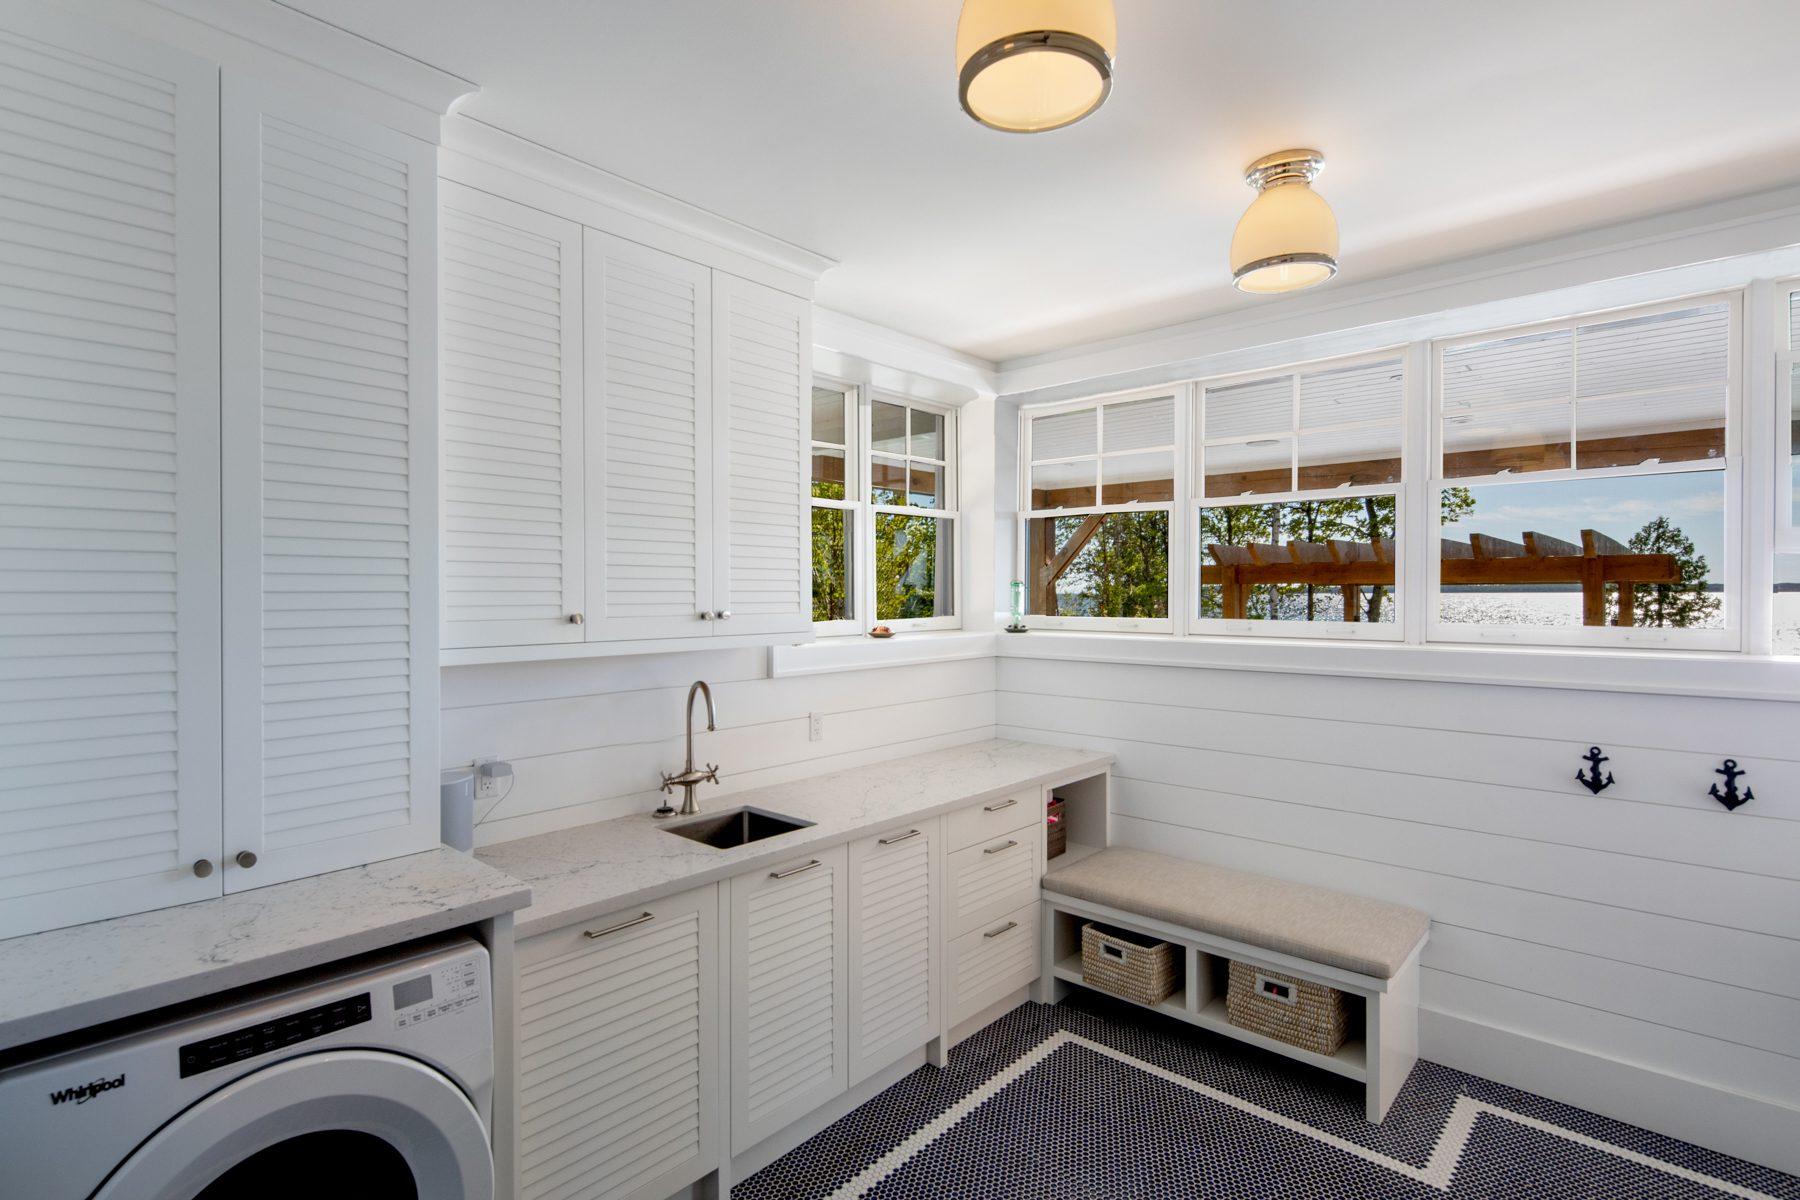 Normerica-Timber-Homes-Timber-Frame-Portfolio-Beachside-Bliss-Interior-Pool-Room-Basement-Laundry-Room